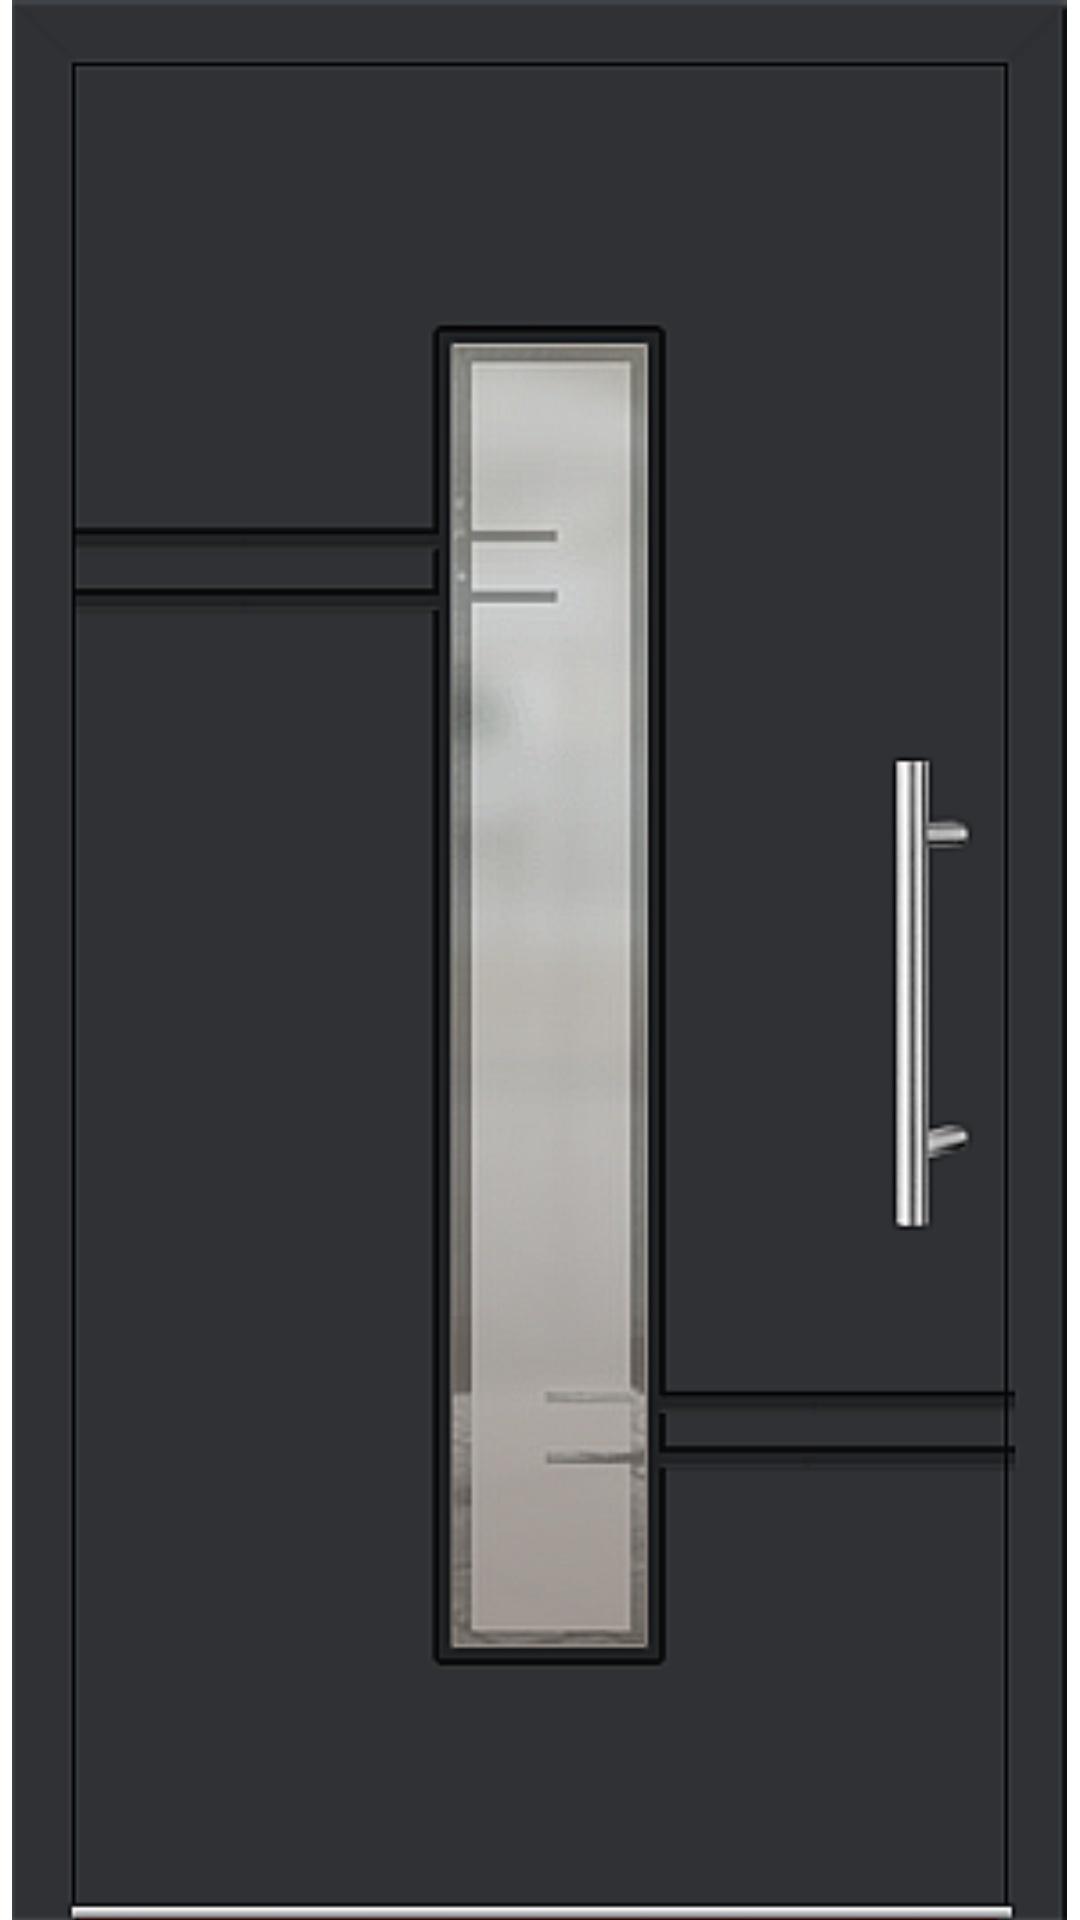 Aluminium Haustür Modell 6814-52 schwarz